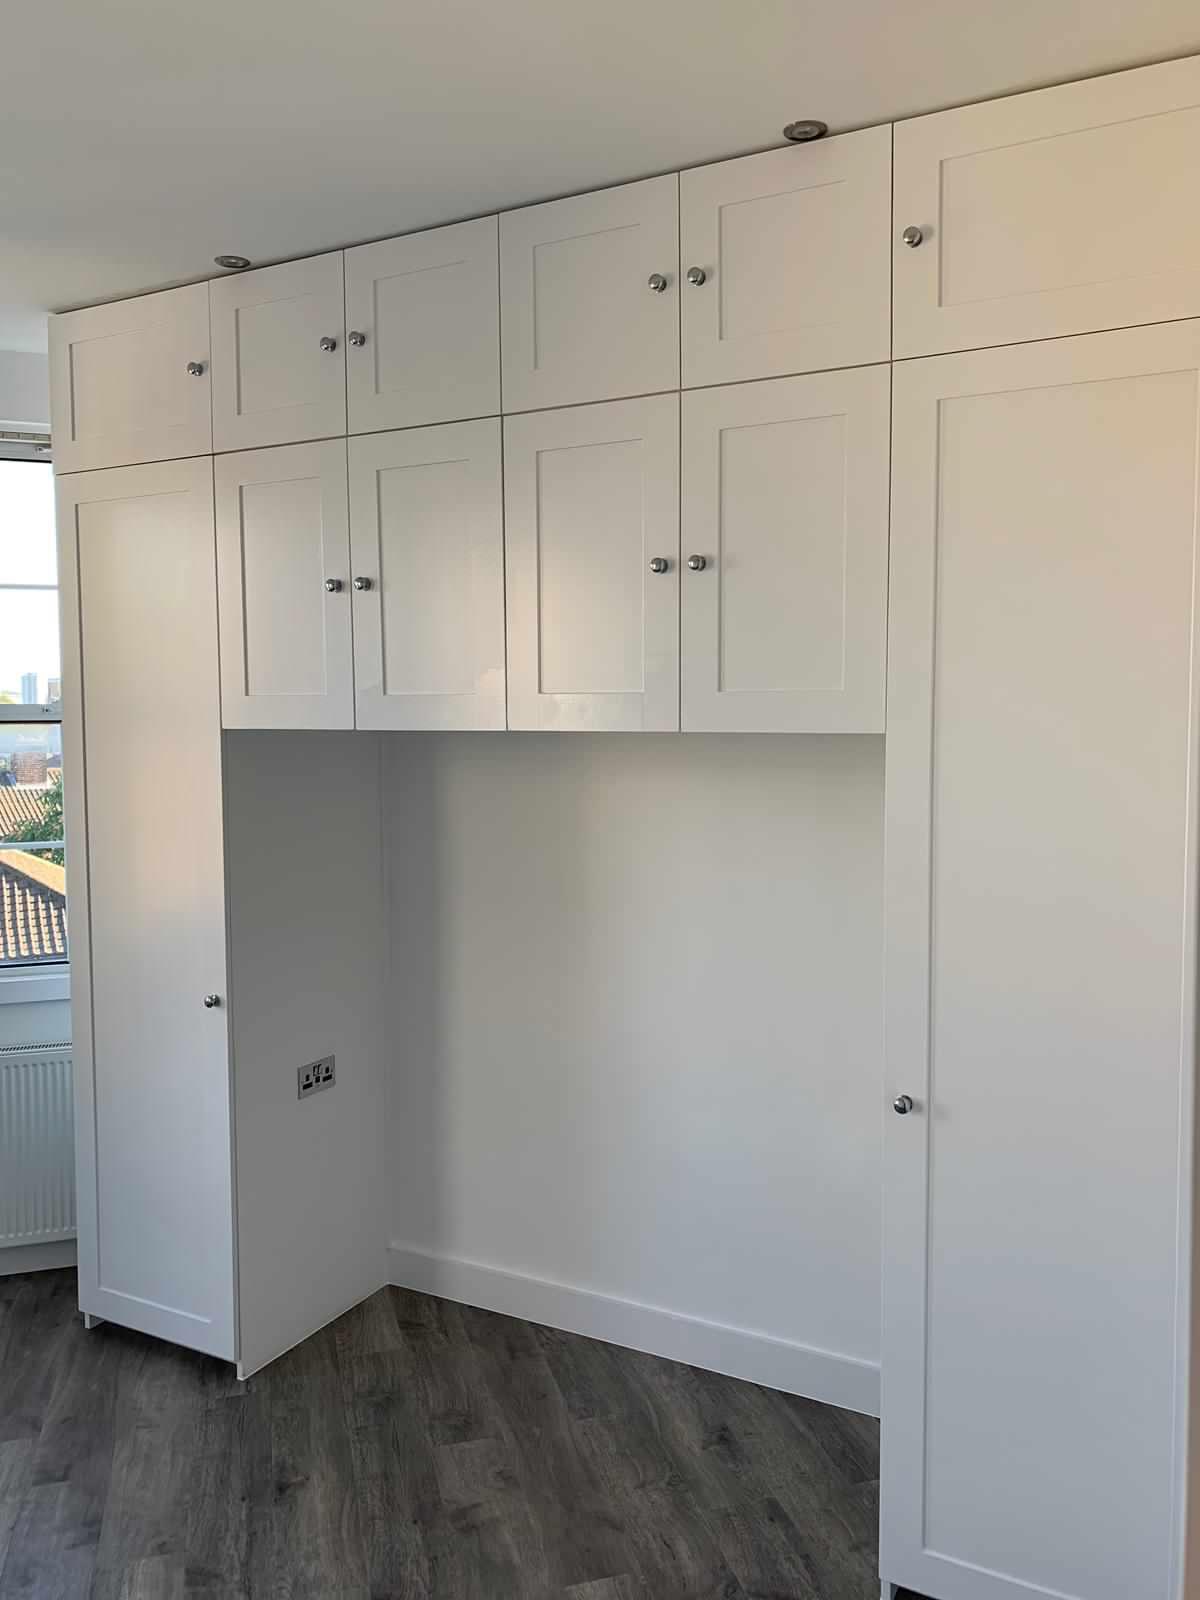 Built in cupboard space